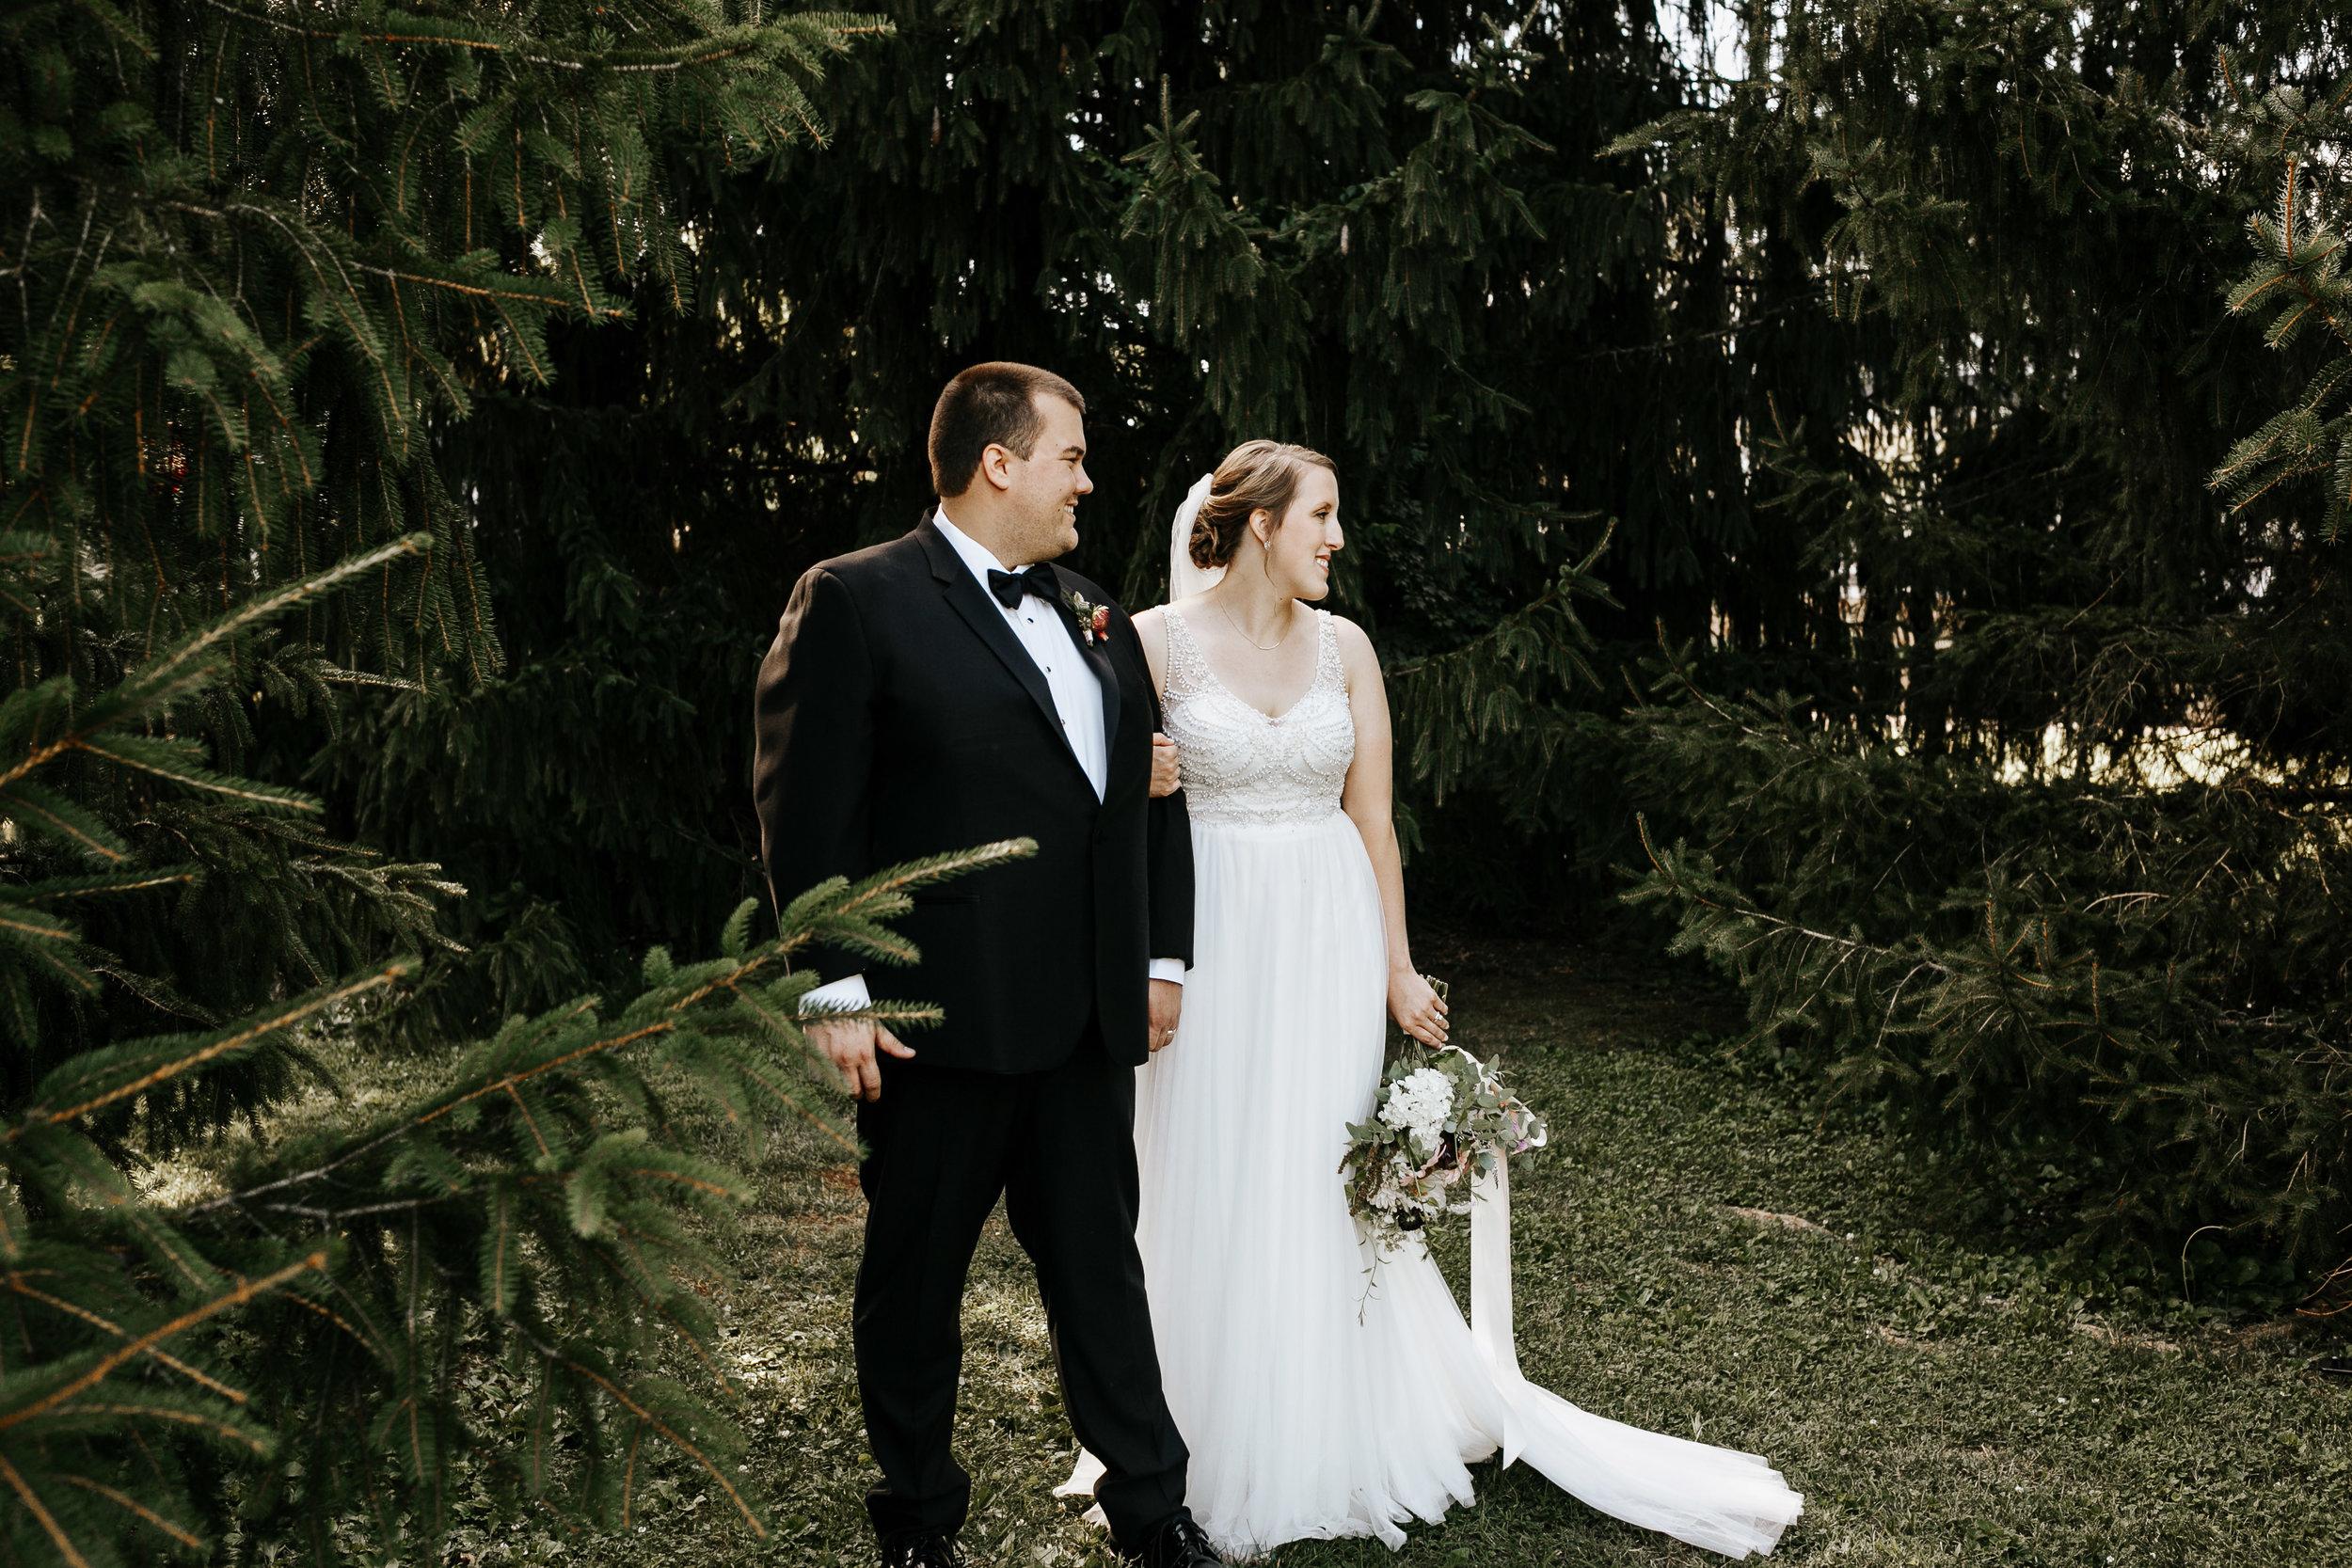 bohemian-photographer-wedding-tennessee-42.jpg